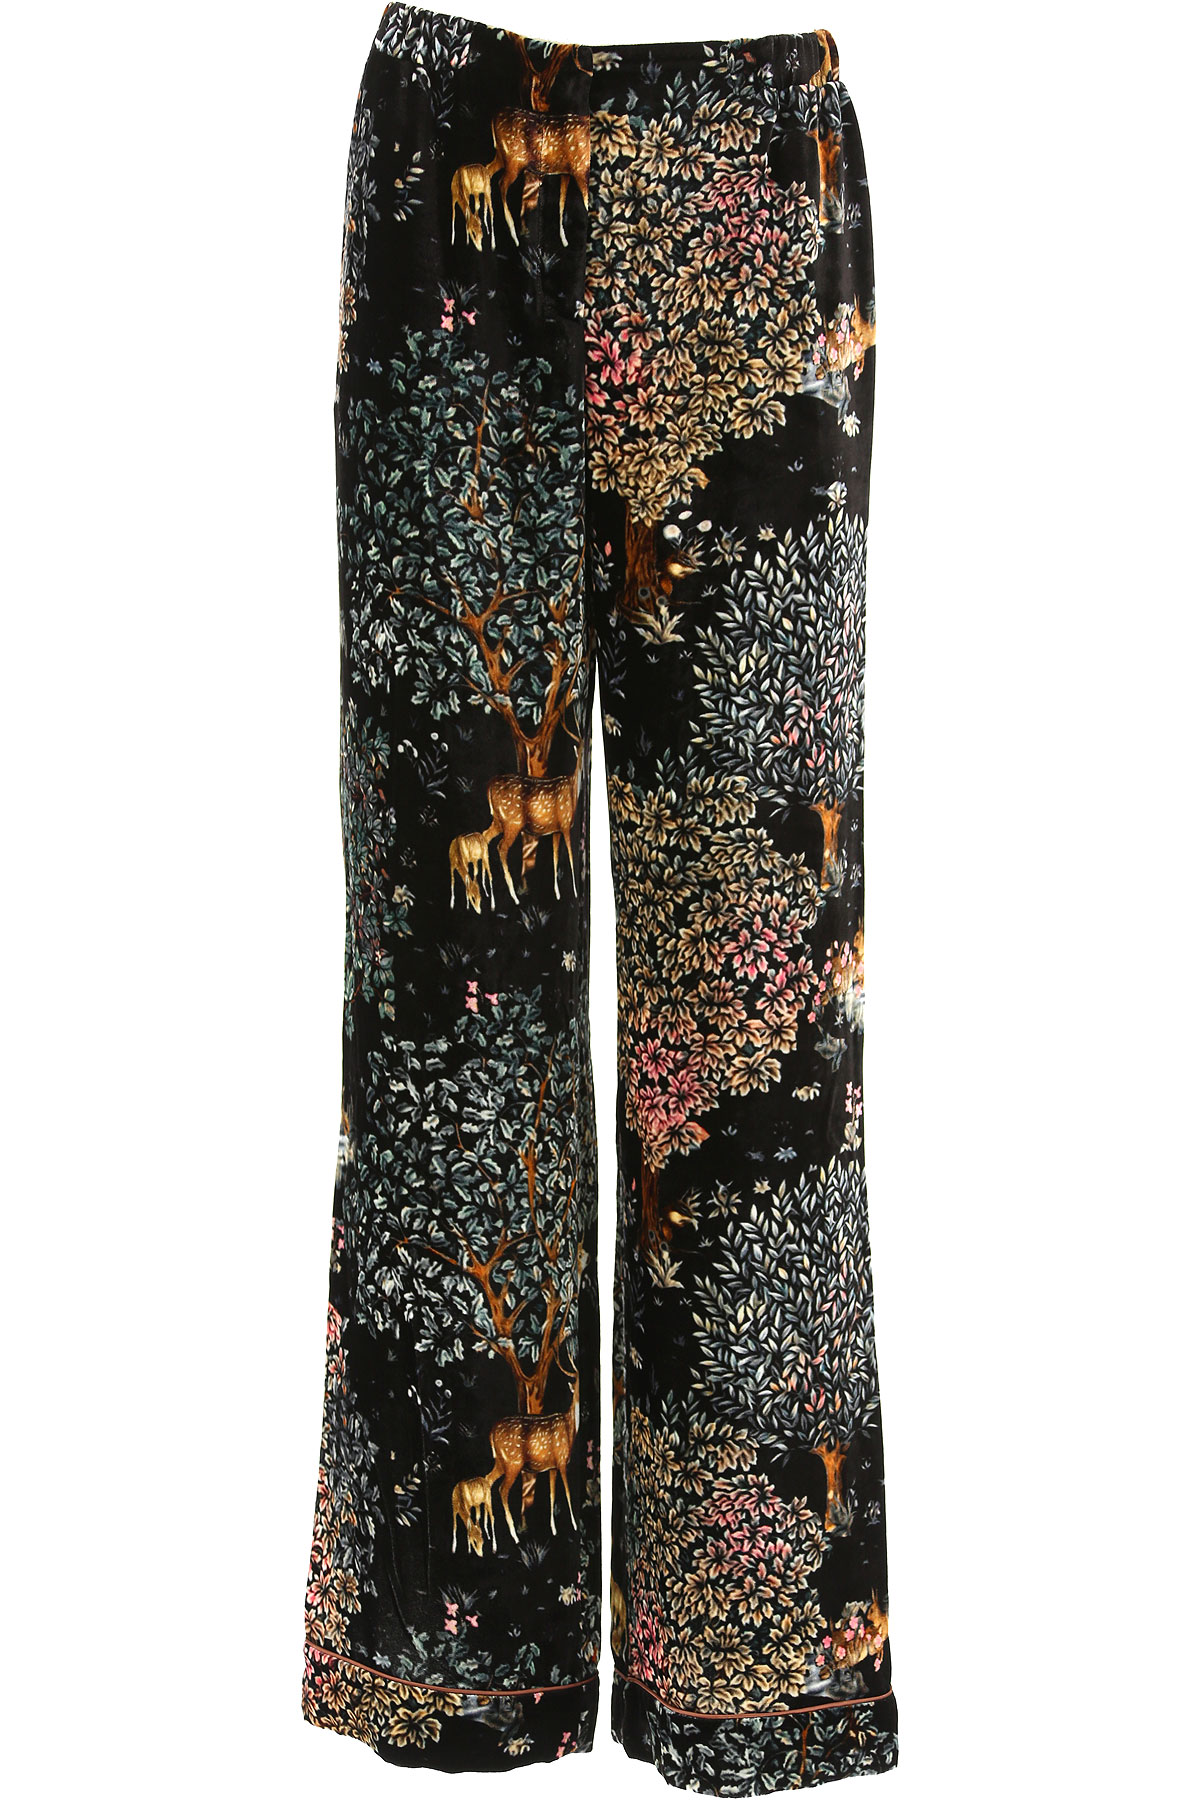 Image of Alberta Ferretti Pants for Women, Black, viscosa, 2017, 26 28